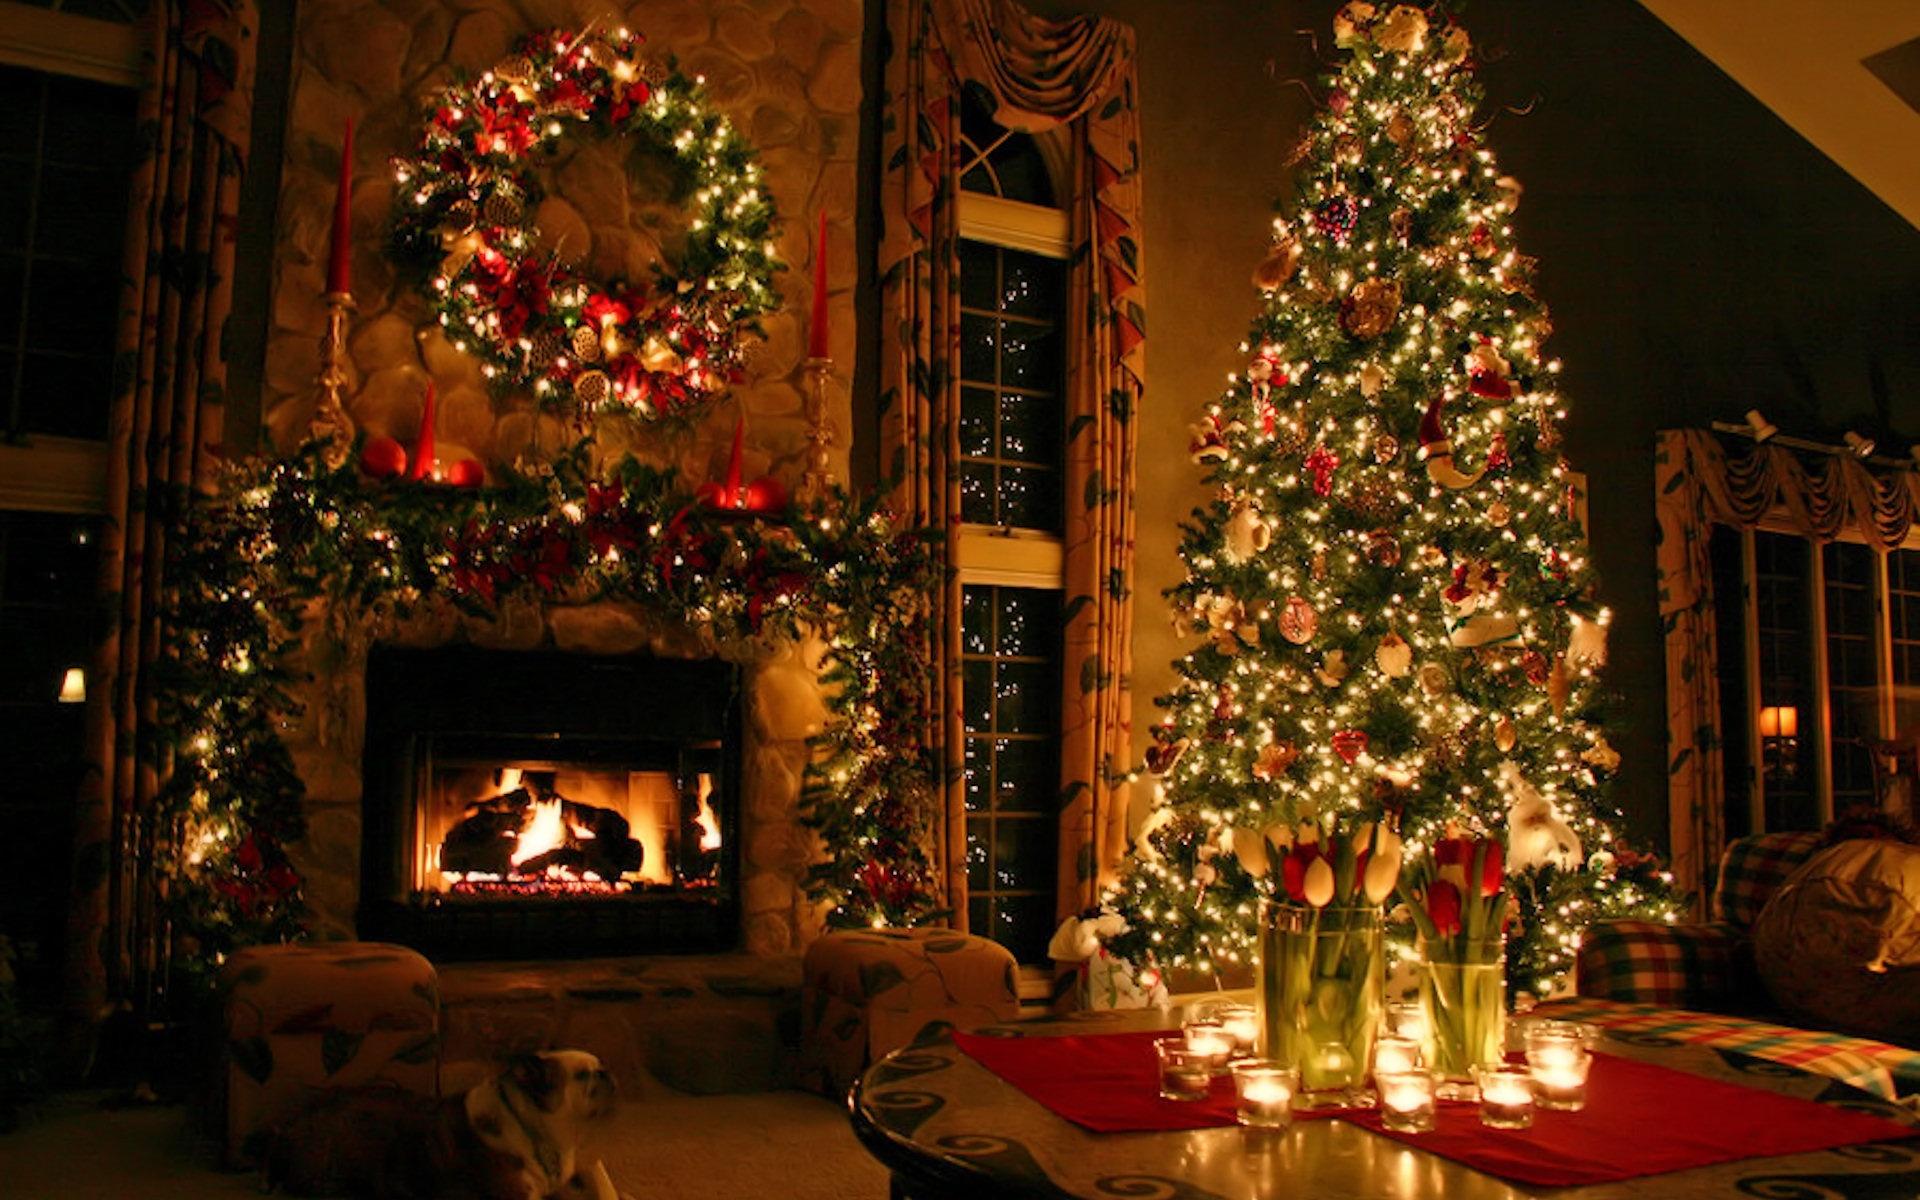 21 Stunningly Beautiful Christmas Desktop Wallpapers | Web Design Mash